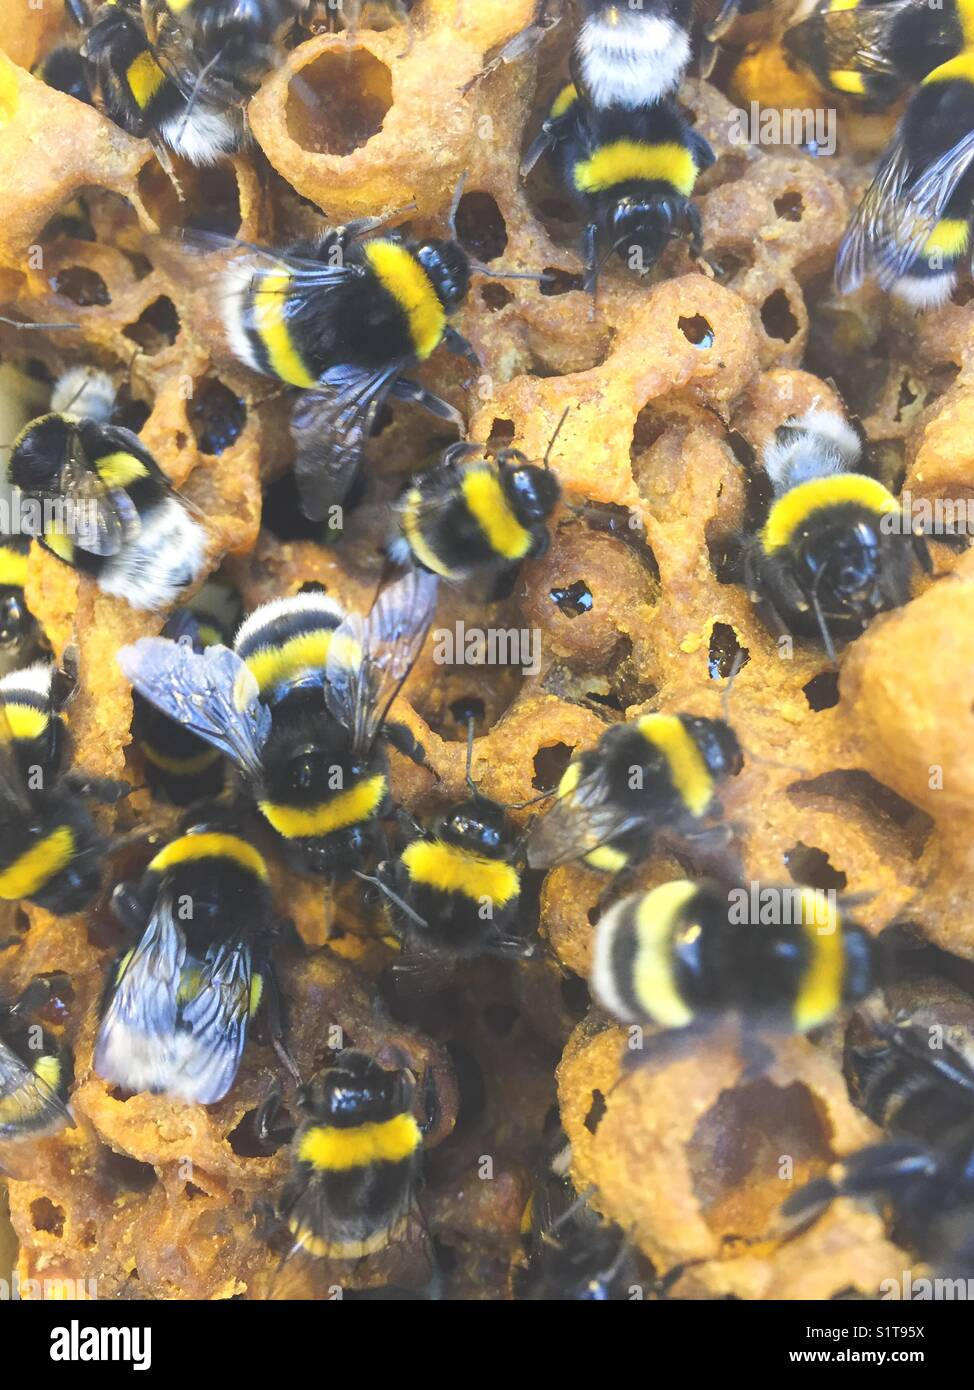 Bestäubenden Bienen im Bienenstock Nahaufnahme Stockbild